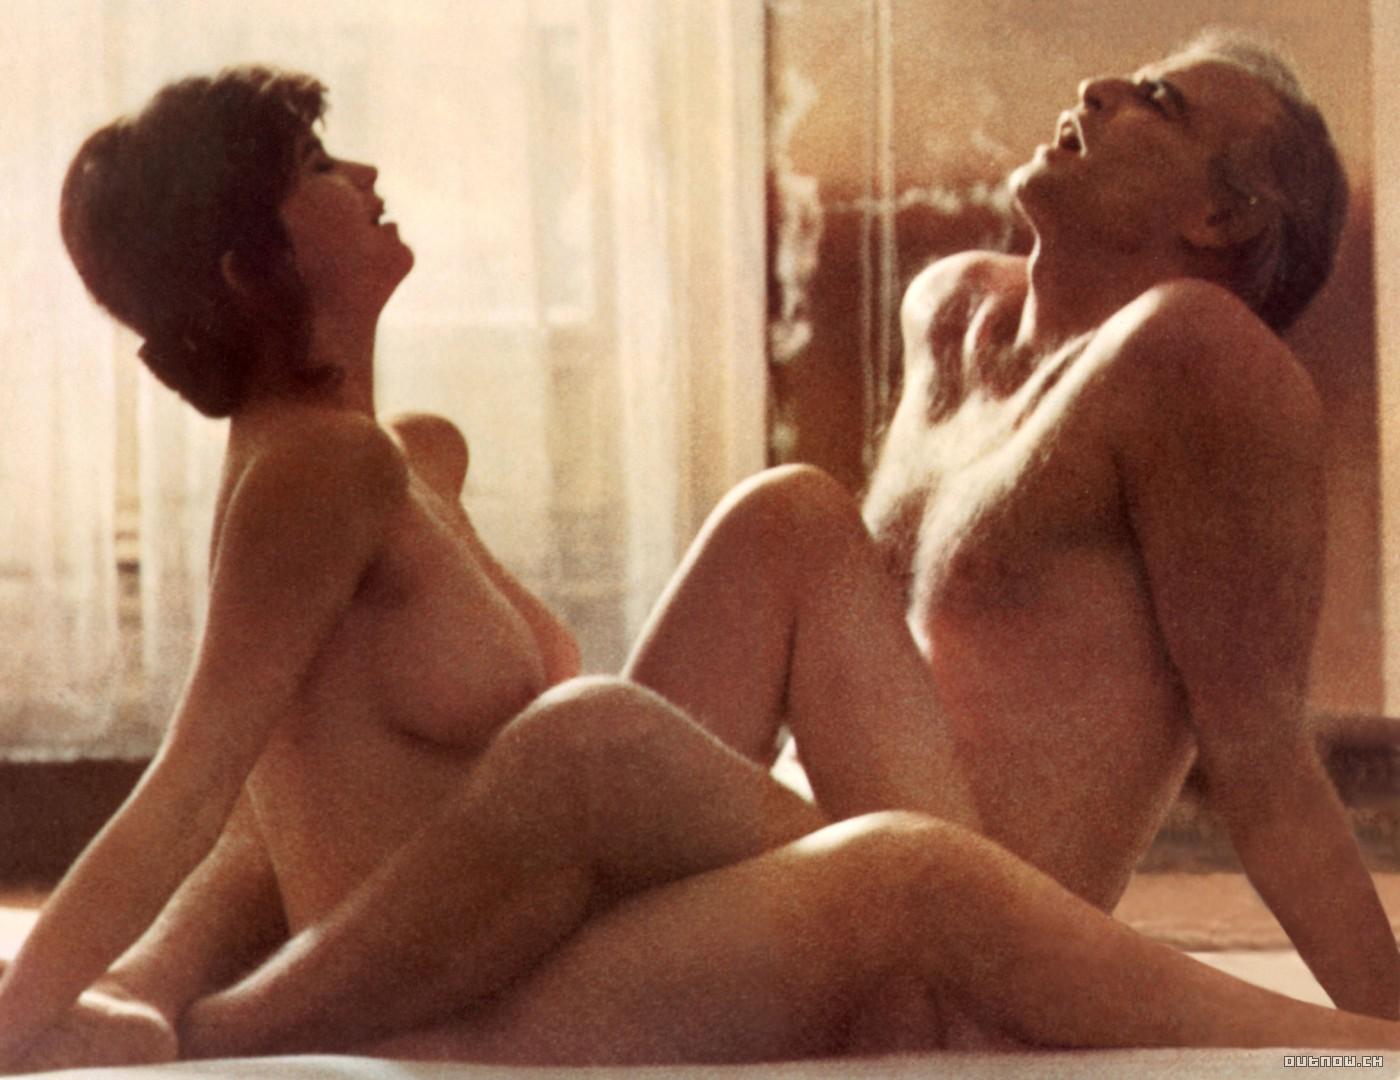 luchshie-seks-stseni